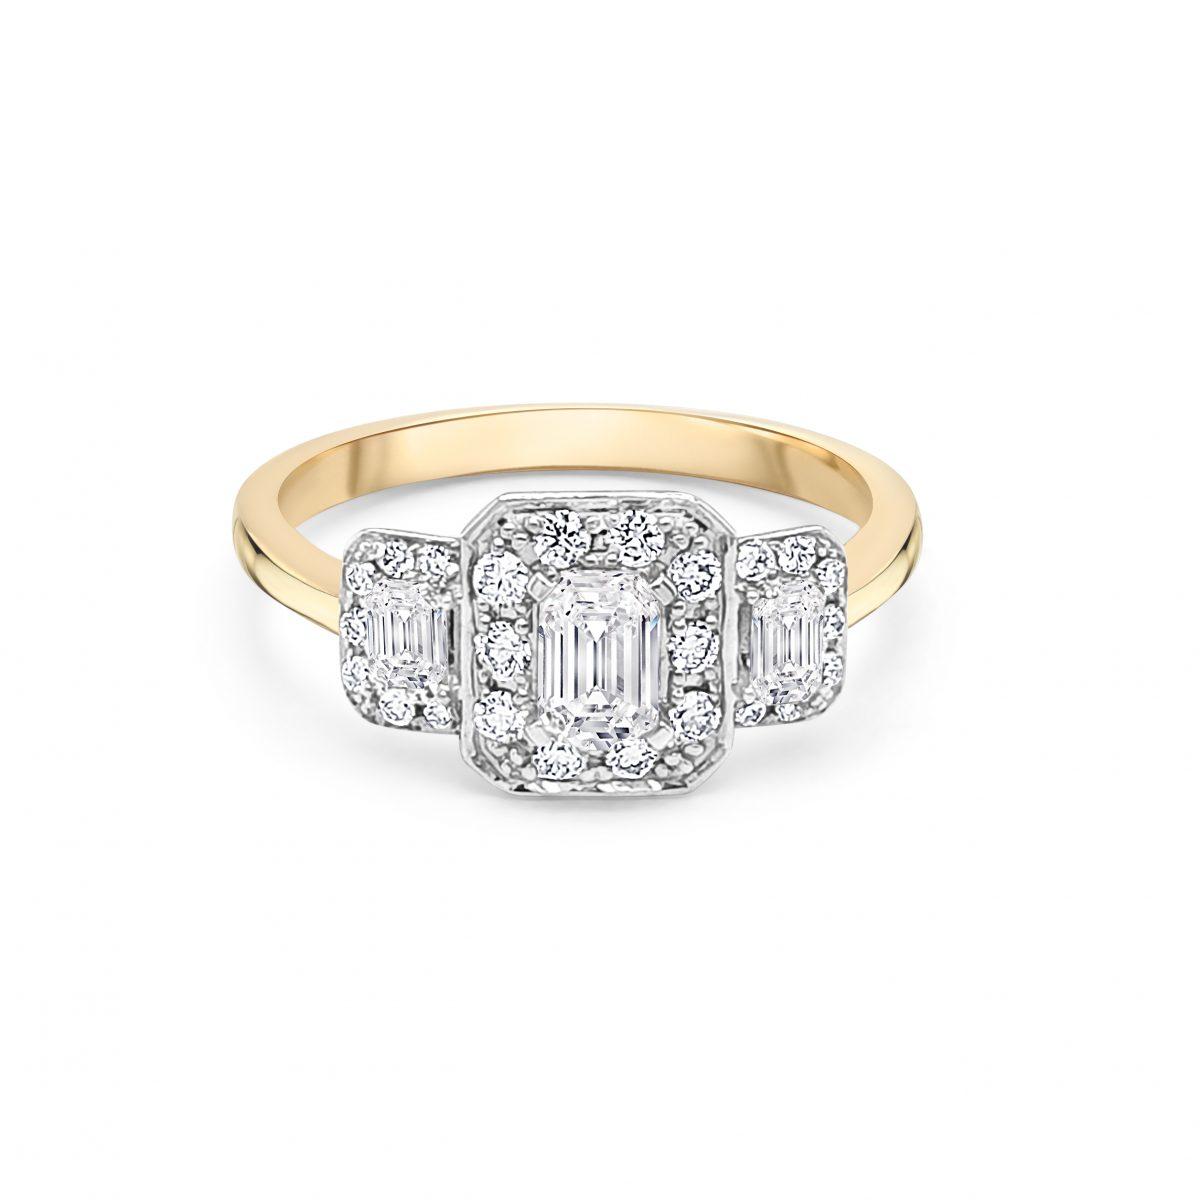 18ct Yellow Gold Three Stone Halo Engagement Ring